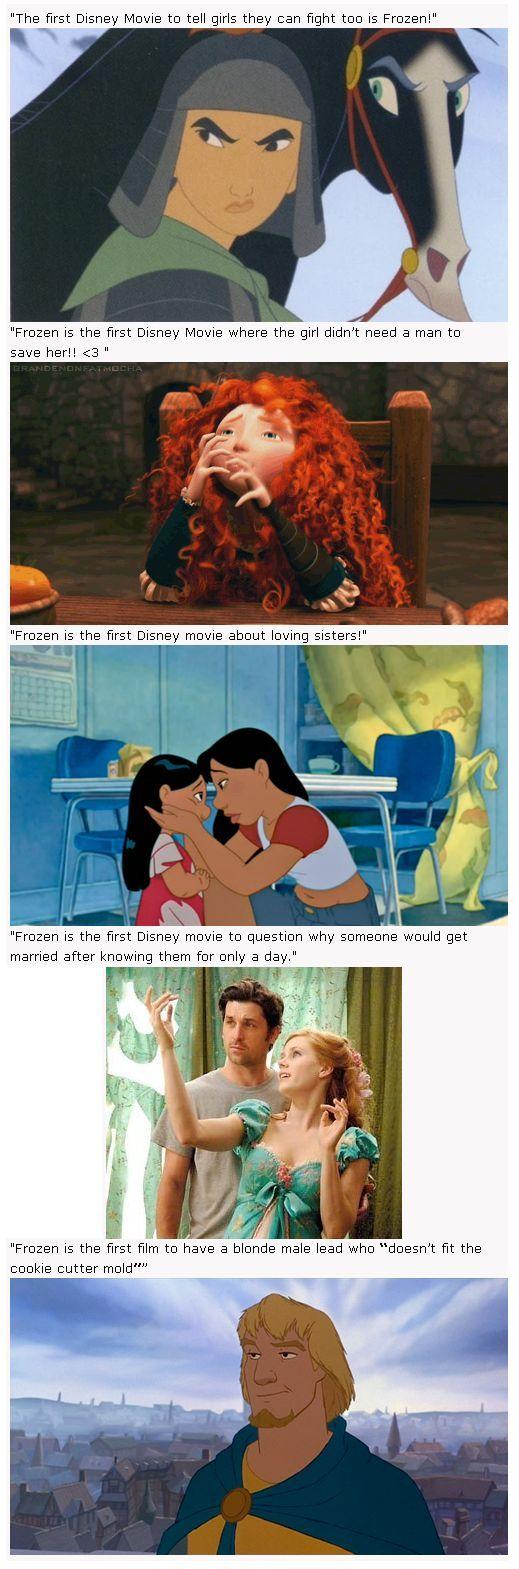 Frozen is not the first disney film